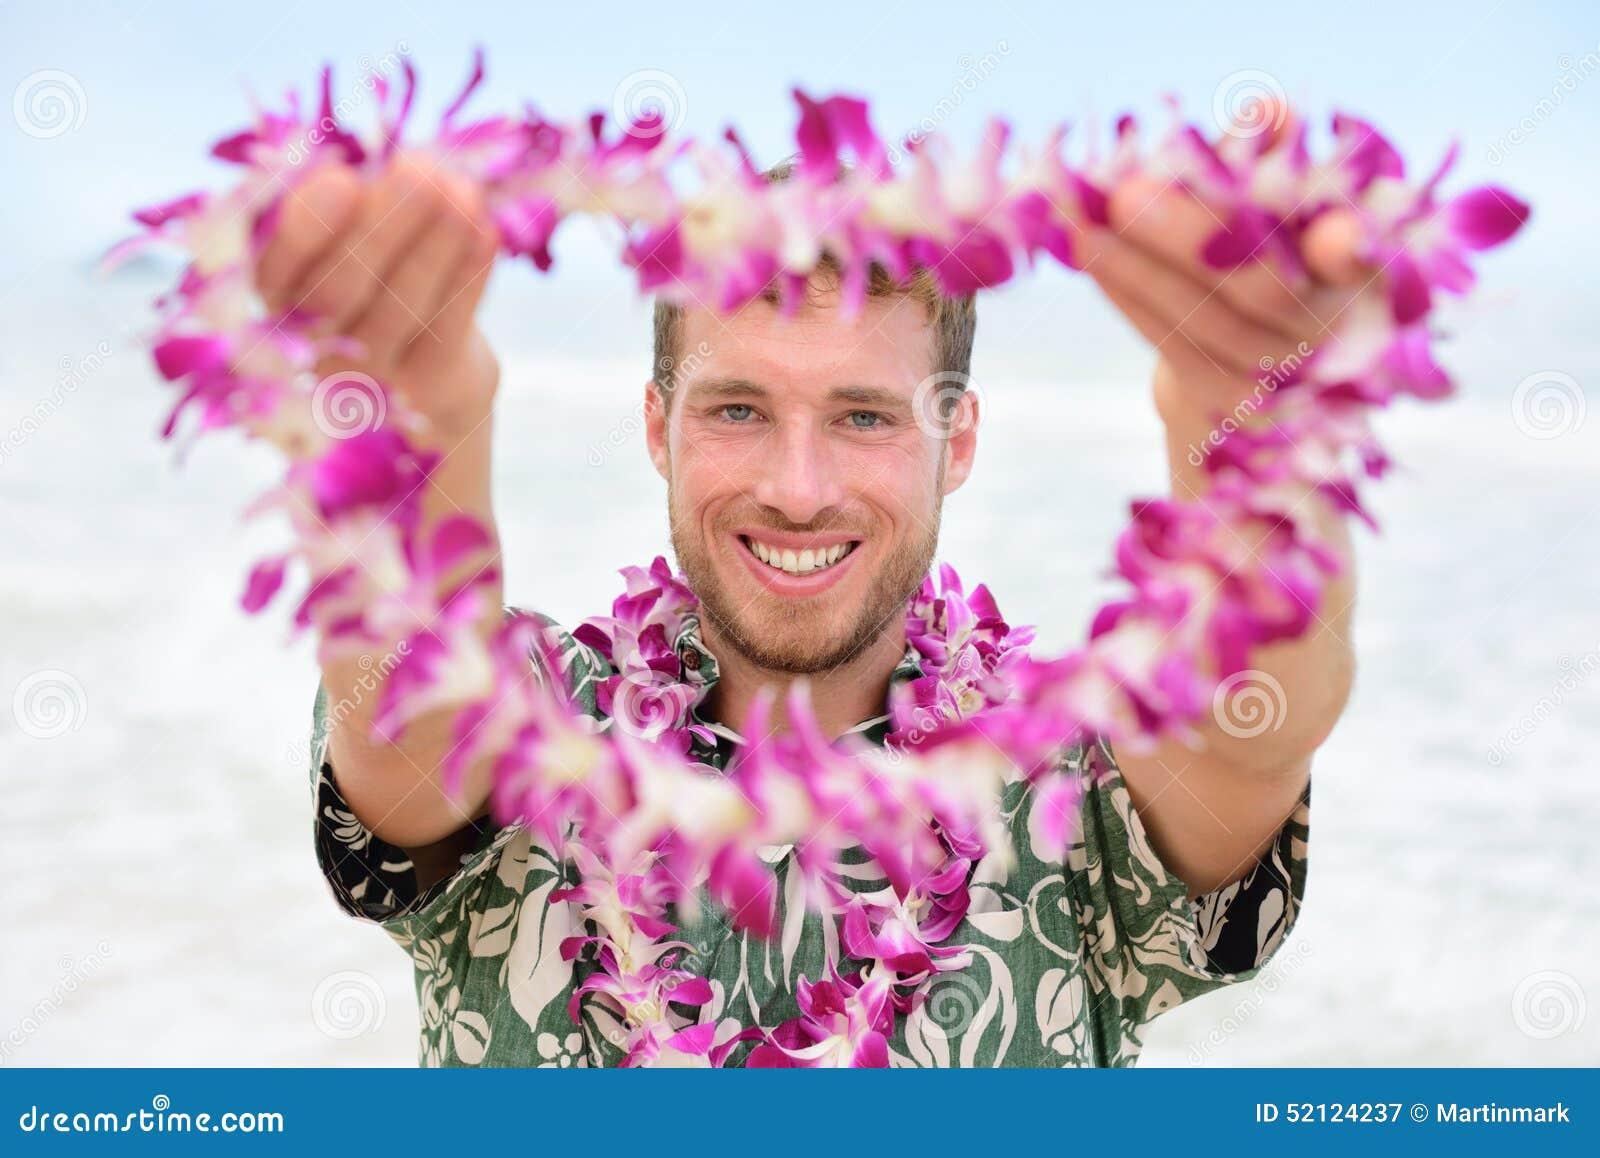 stock image of hawaiian - photo #36